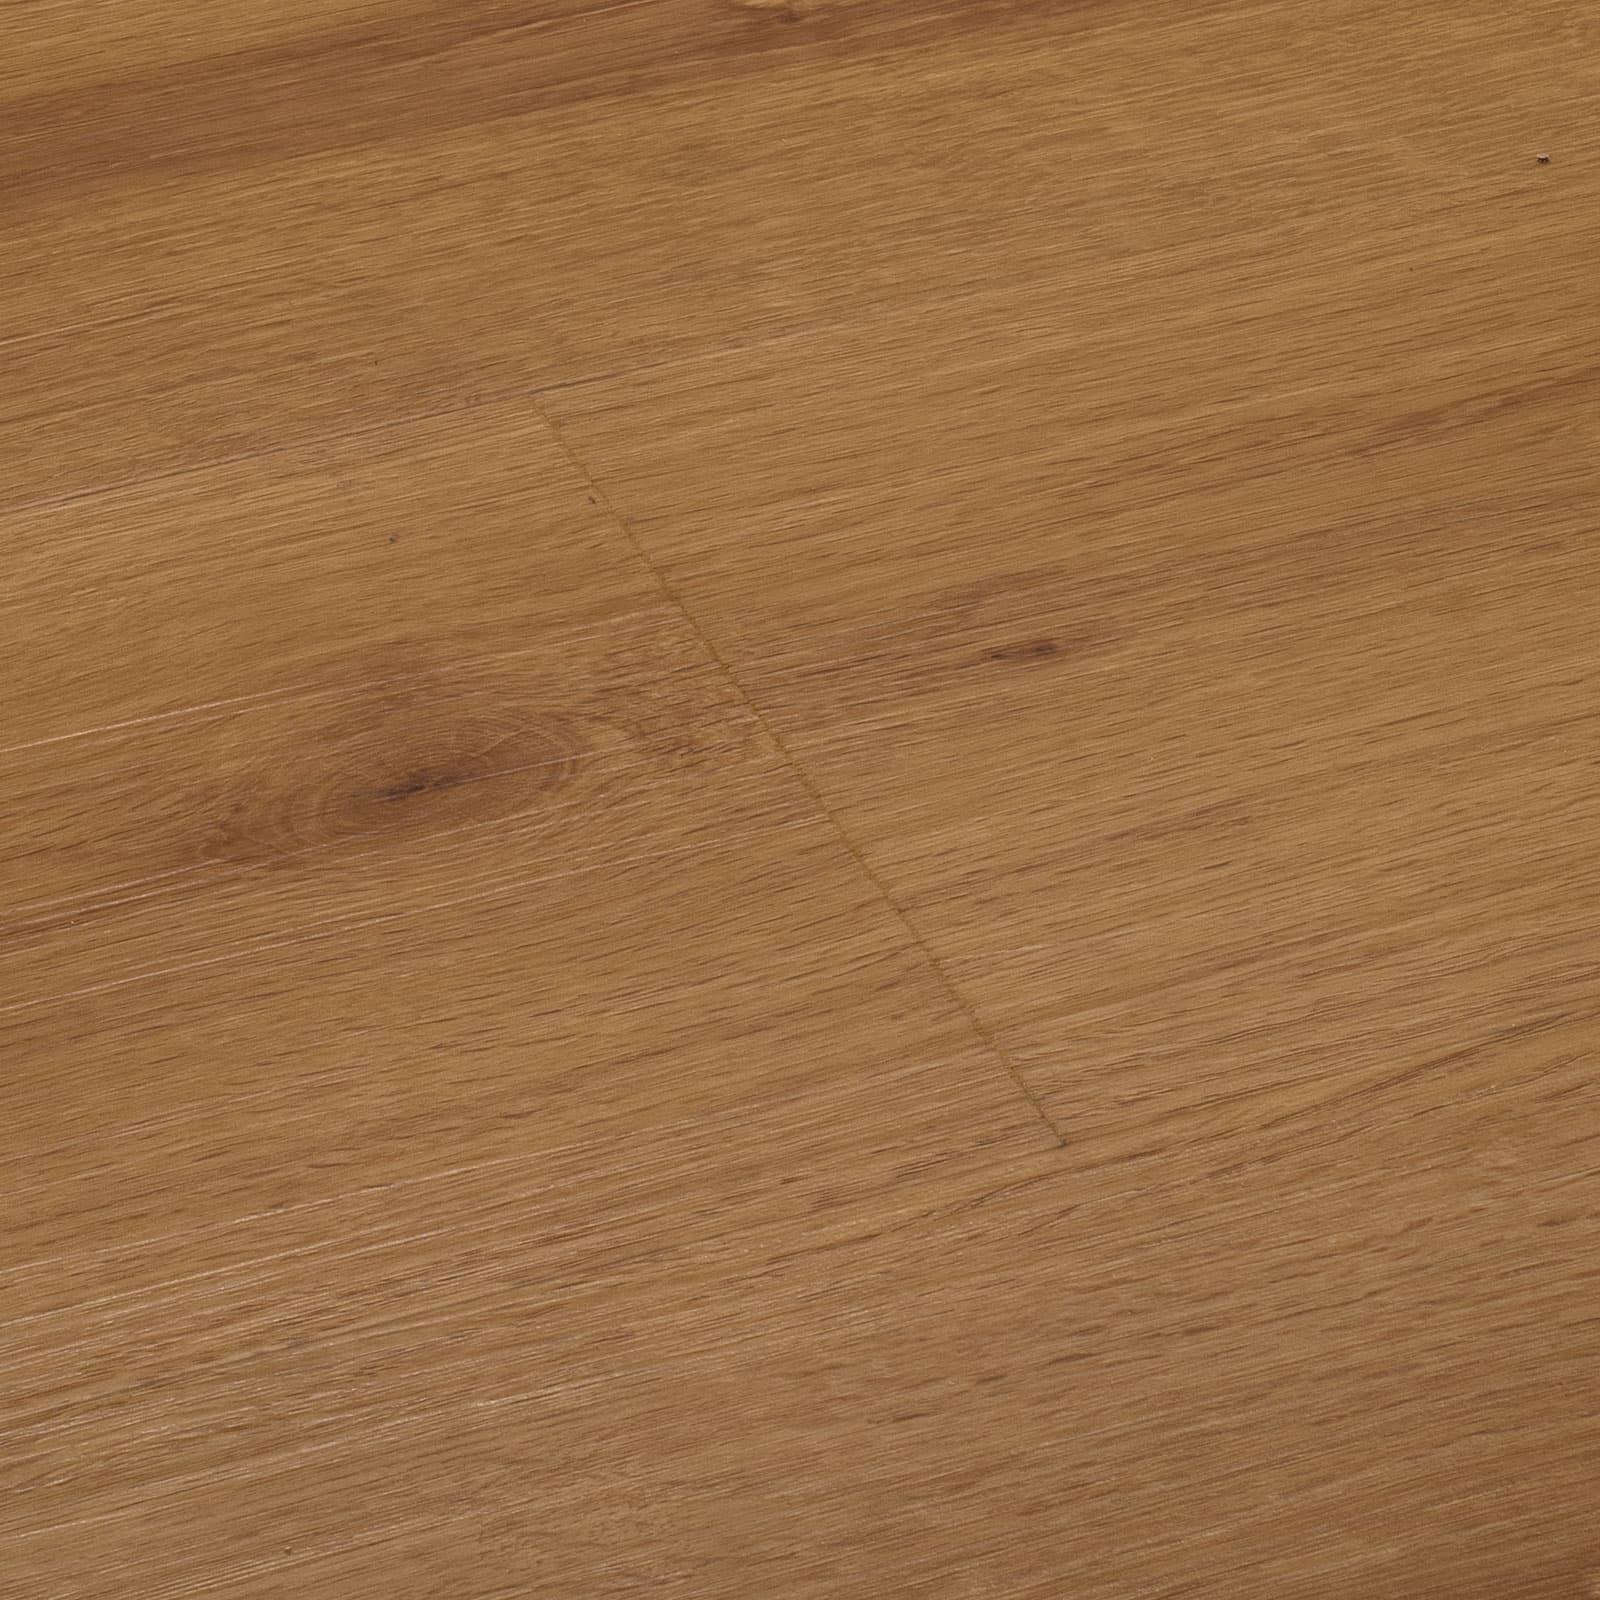 natural oak laminate moisture resistant flooring